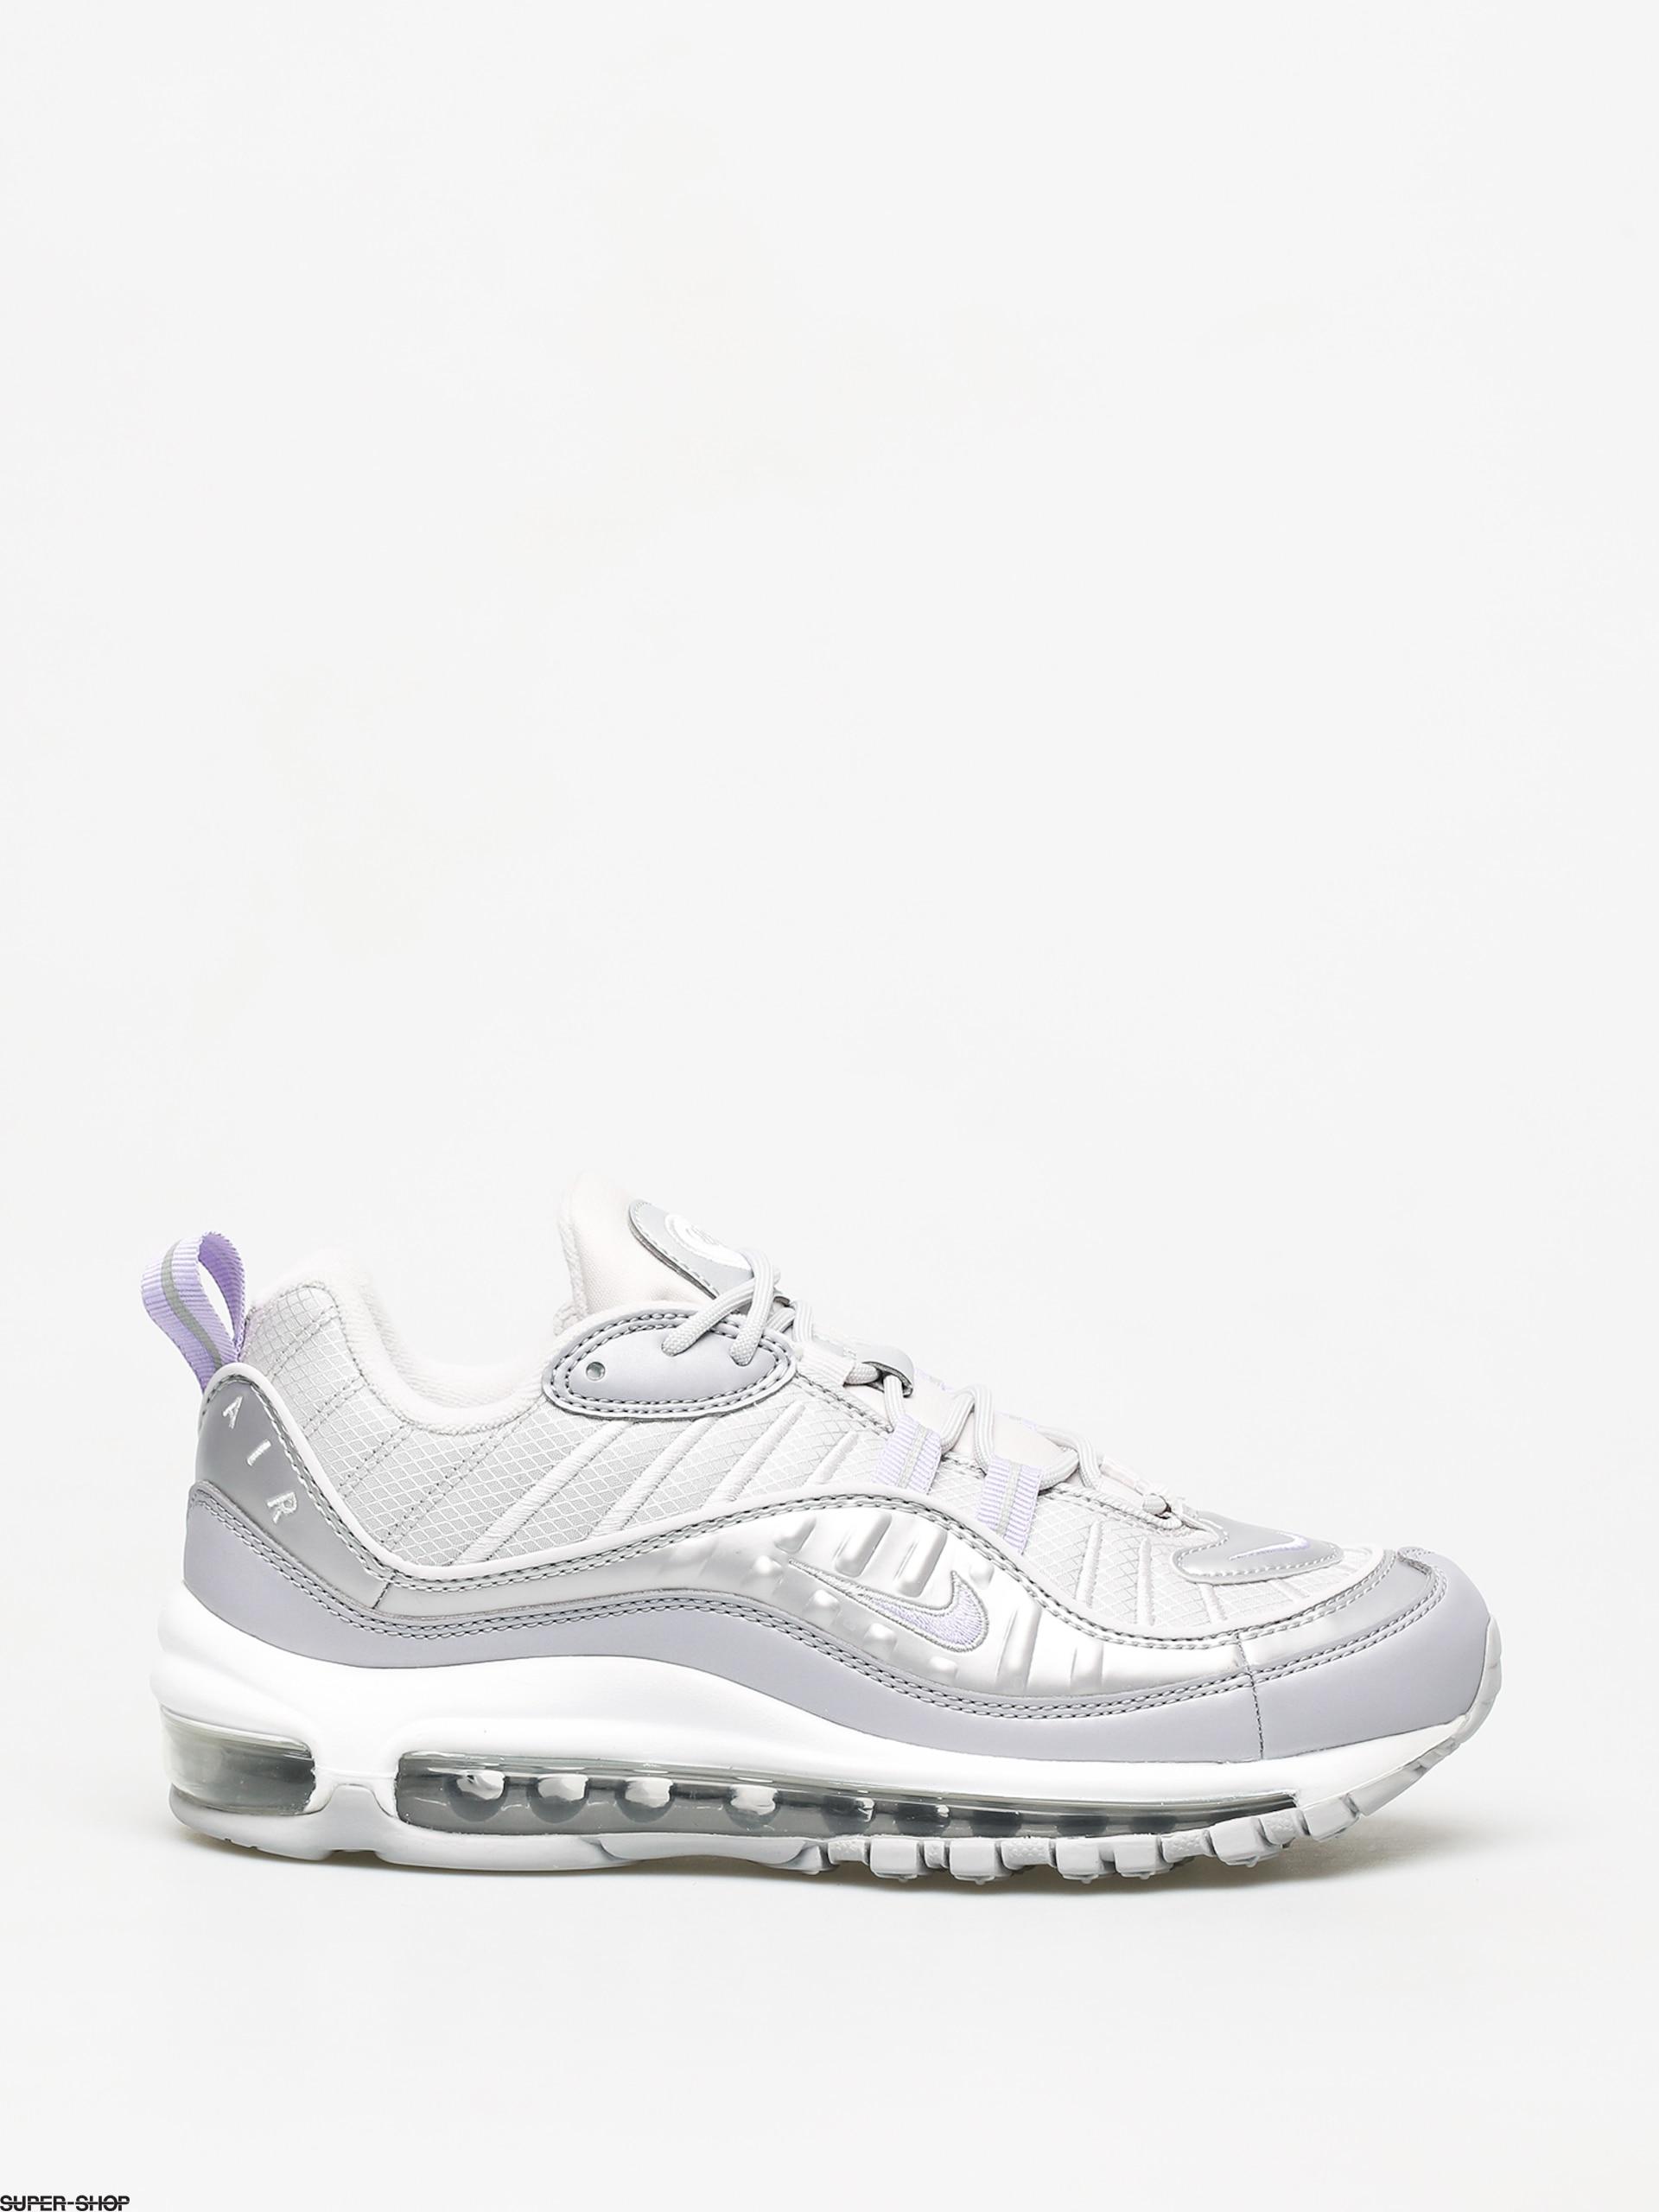 centavo ama de casa Corte de pelo  Nike Air Max 98 Se Shoes Wmn (vast grey/purple agate mtlc platinum)